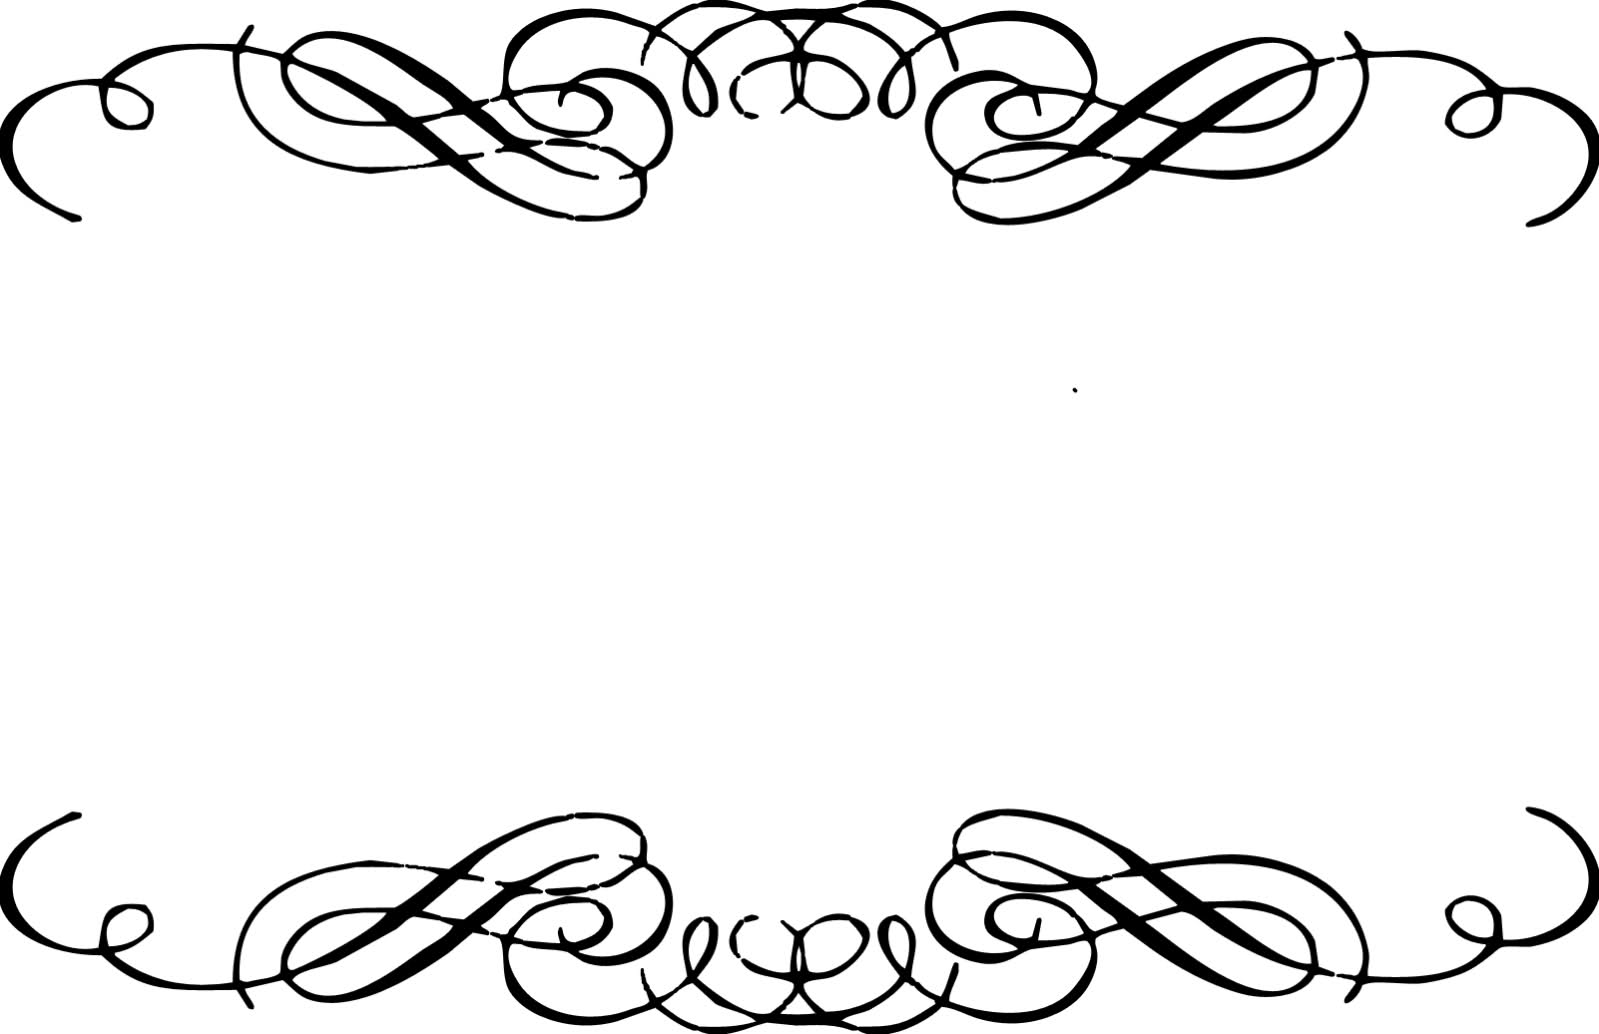 1599x1034 Fancy Border Clip Art